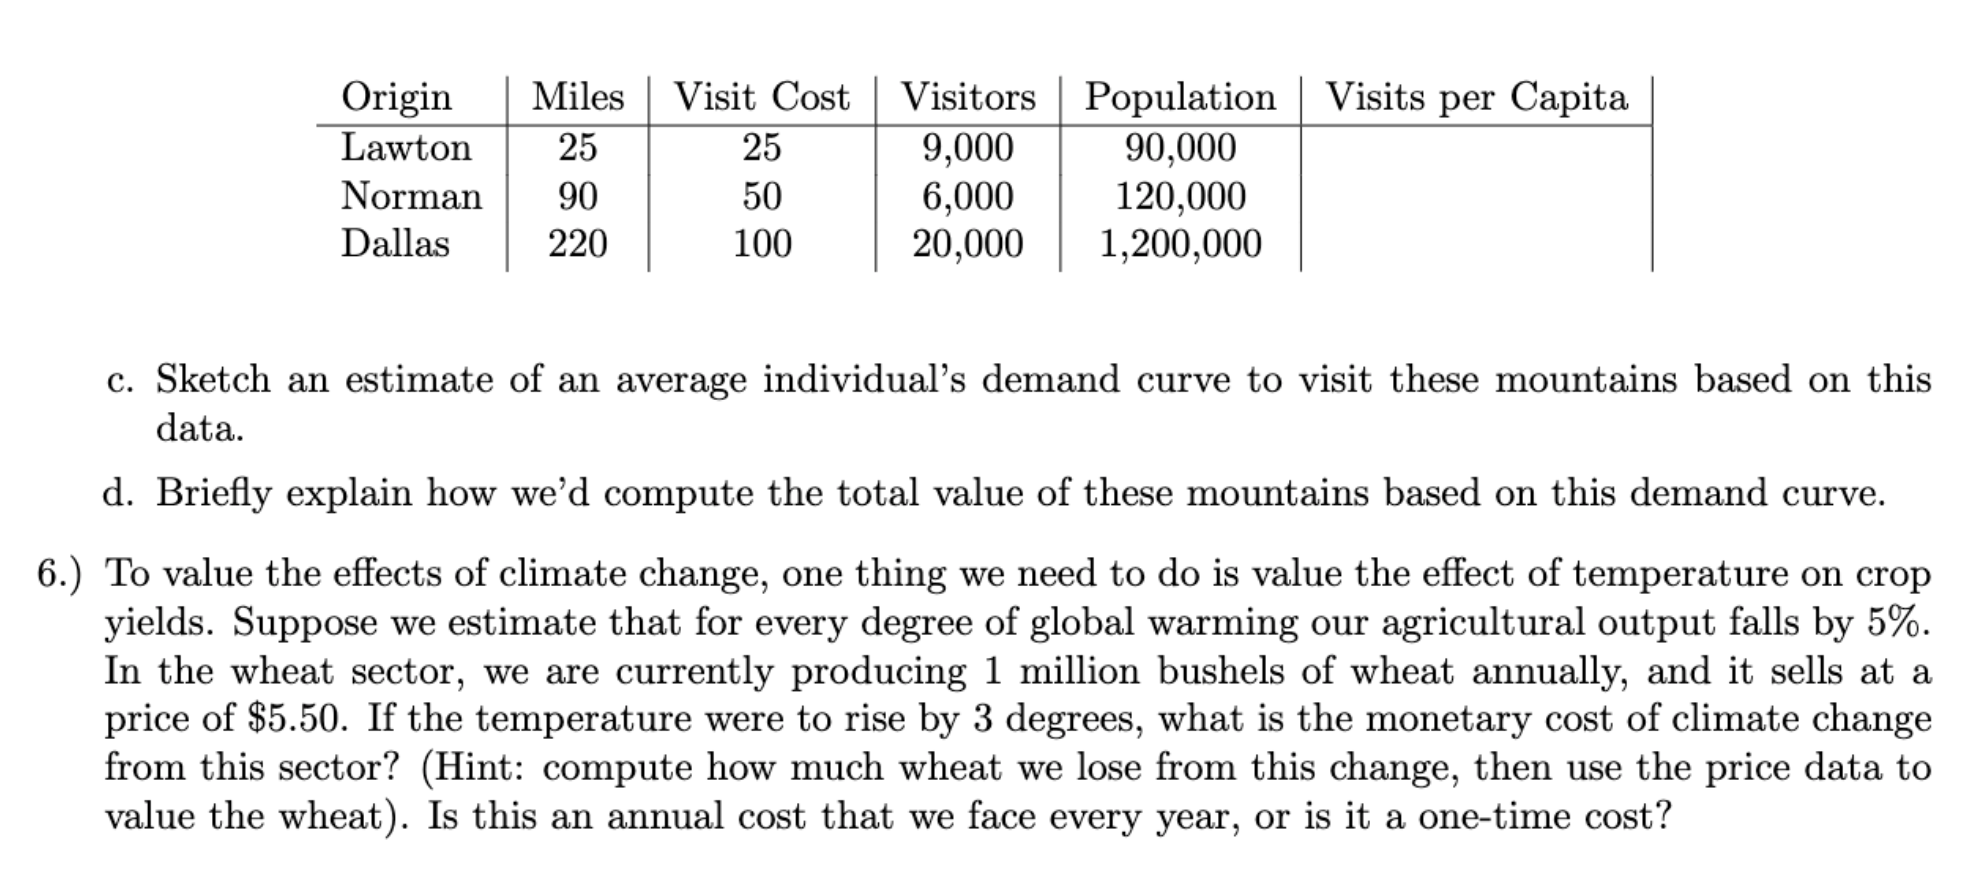   Miles Visits per Capita 25 25 Origin Lawton Norman Dallas Visit Cost   Visitors   Population 9,000 90,000 120,000 100 20,00